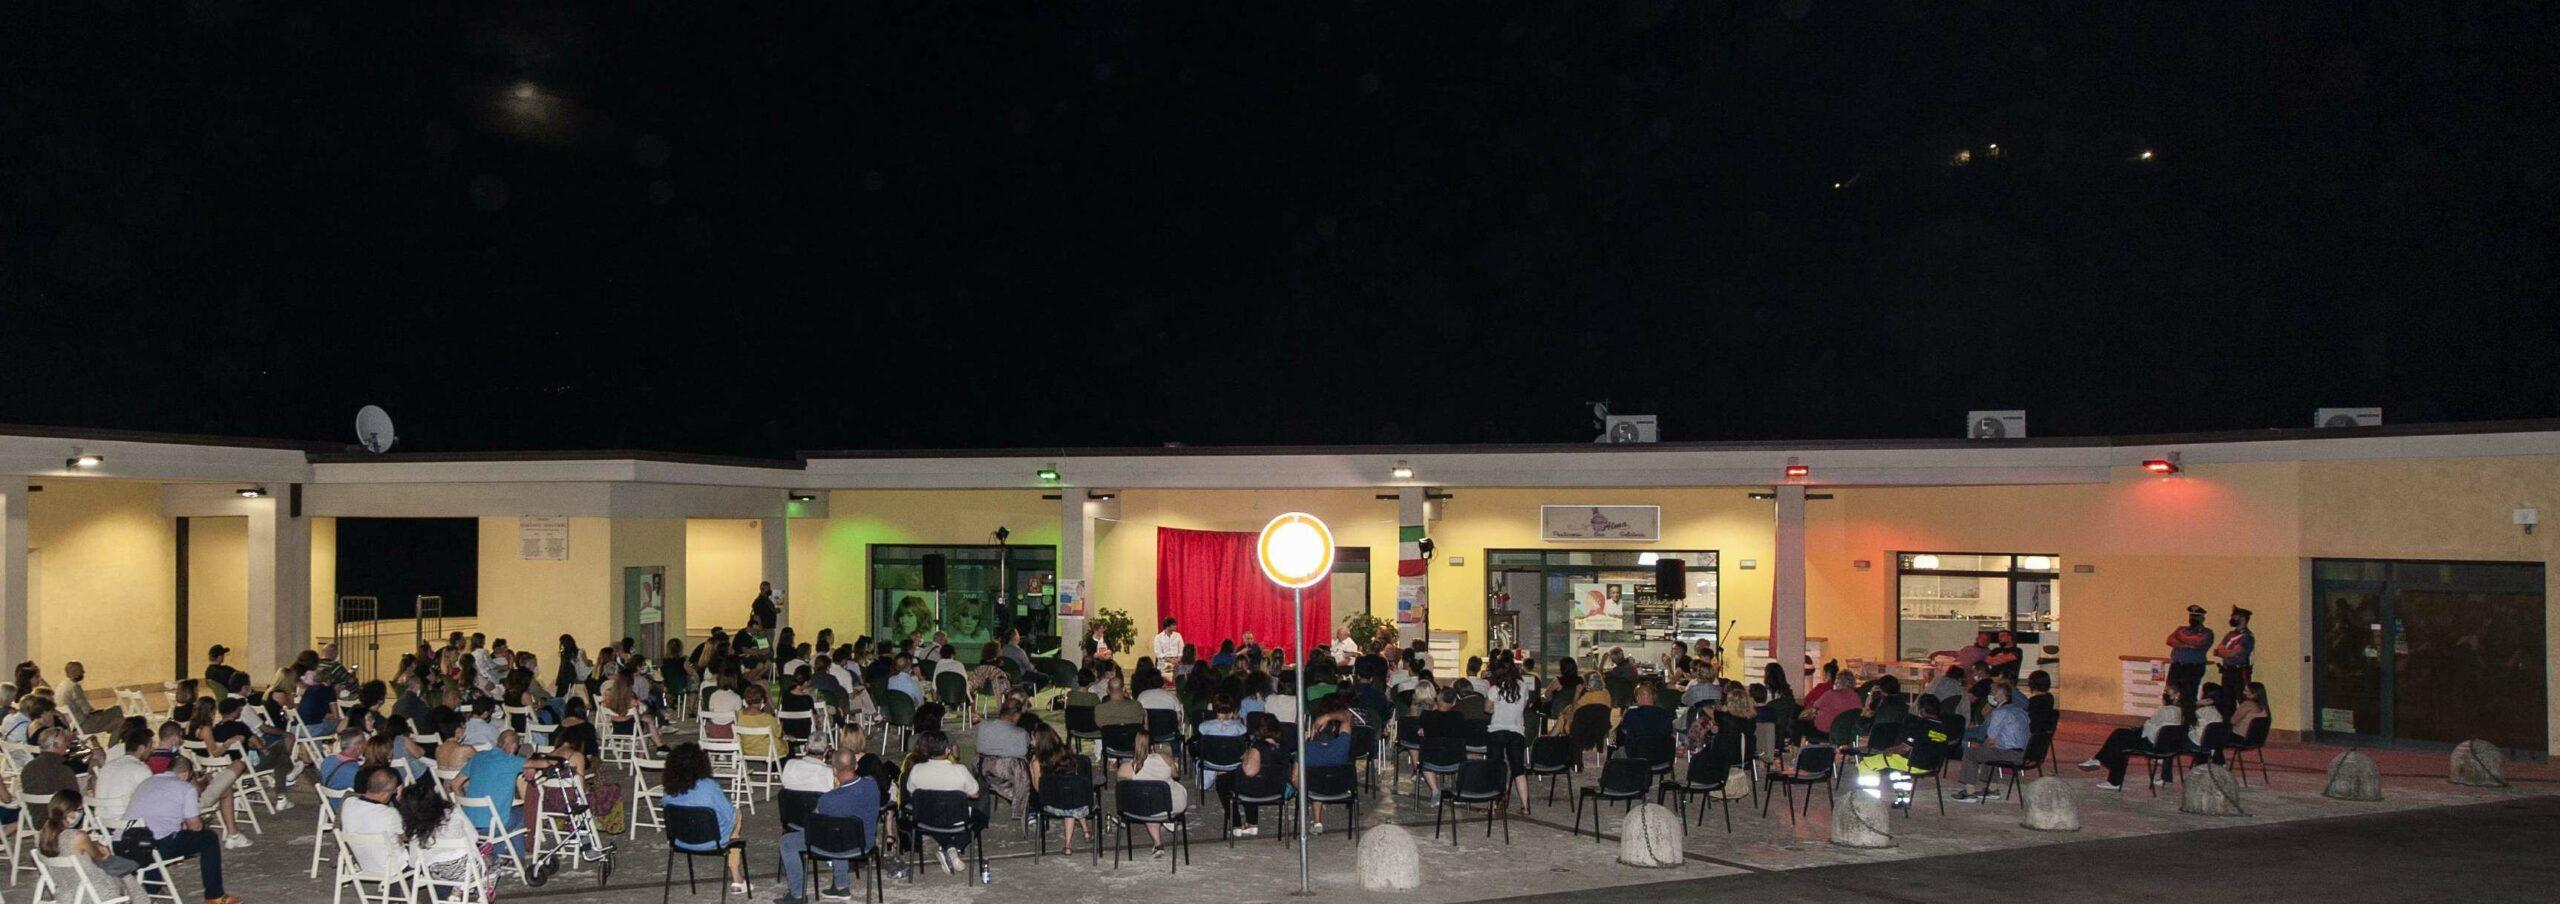 Venarotta Turismo_Roberto-Vecchioni-Ph.-Oliviero-Toscani